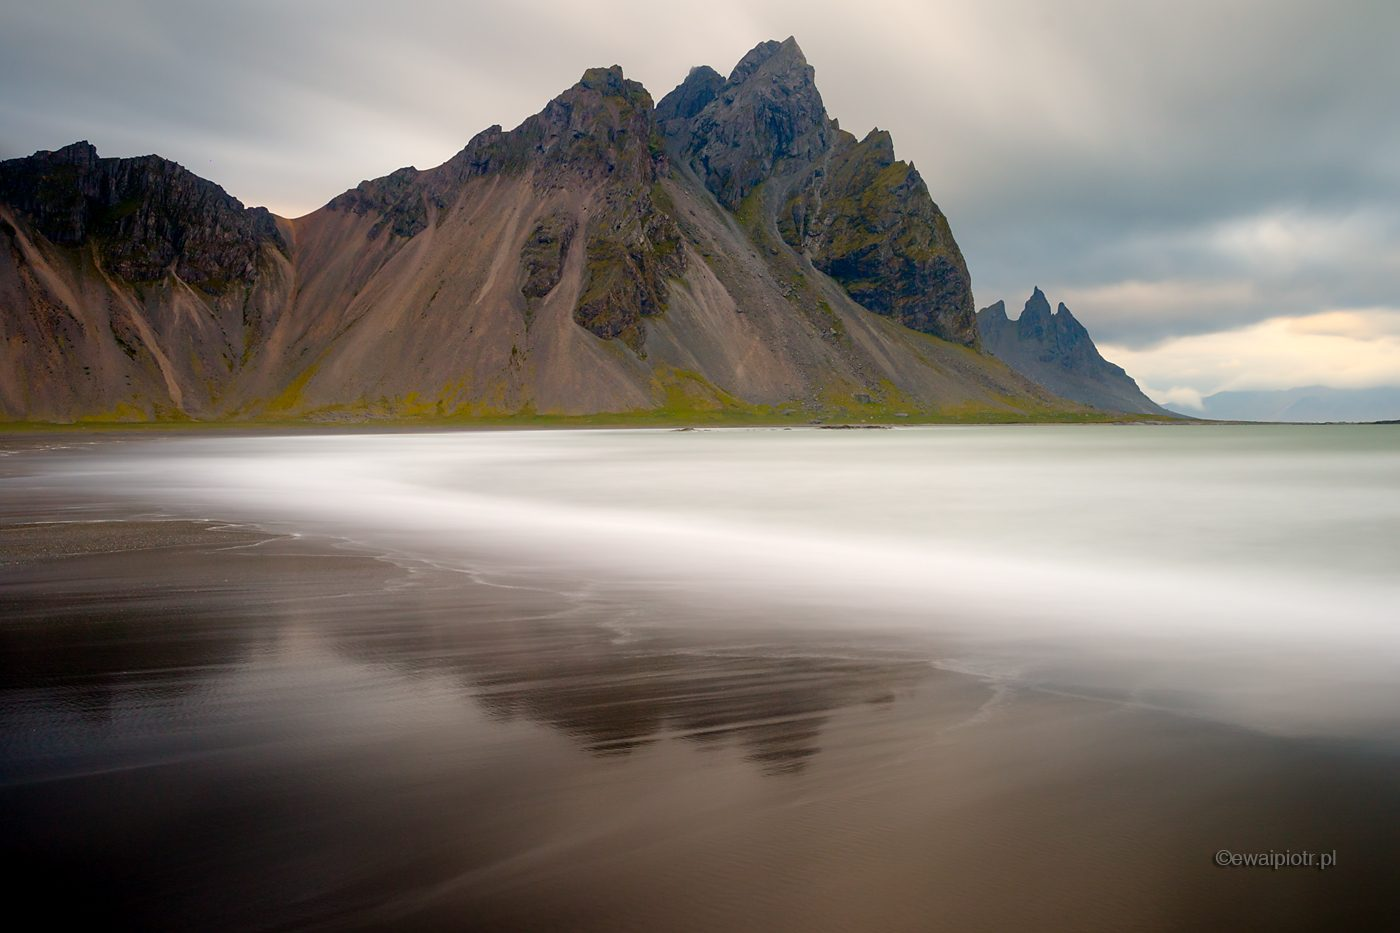 Vestrahorn i plaża, Islandia